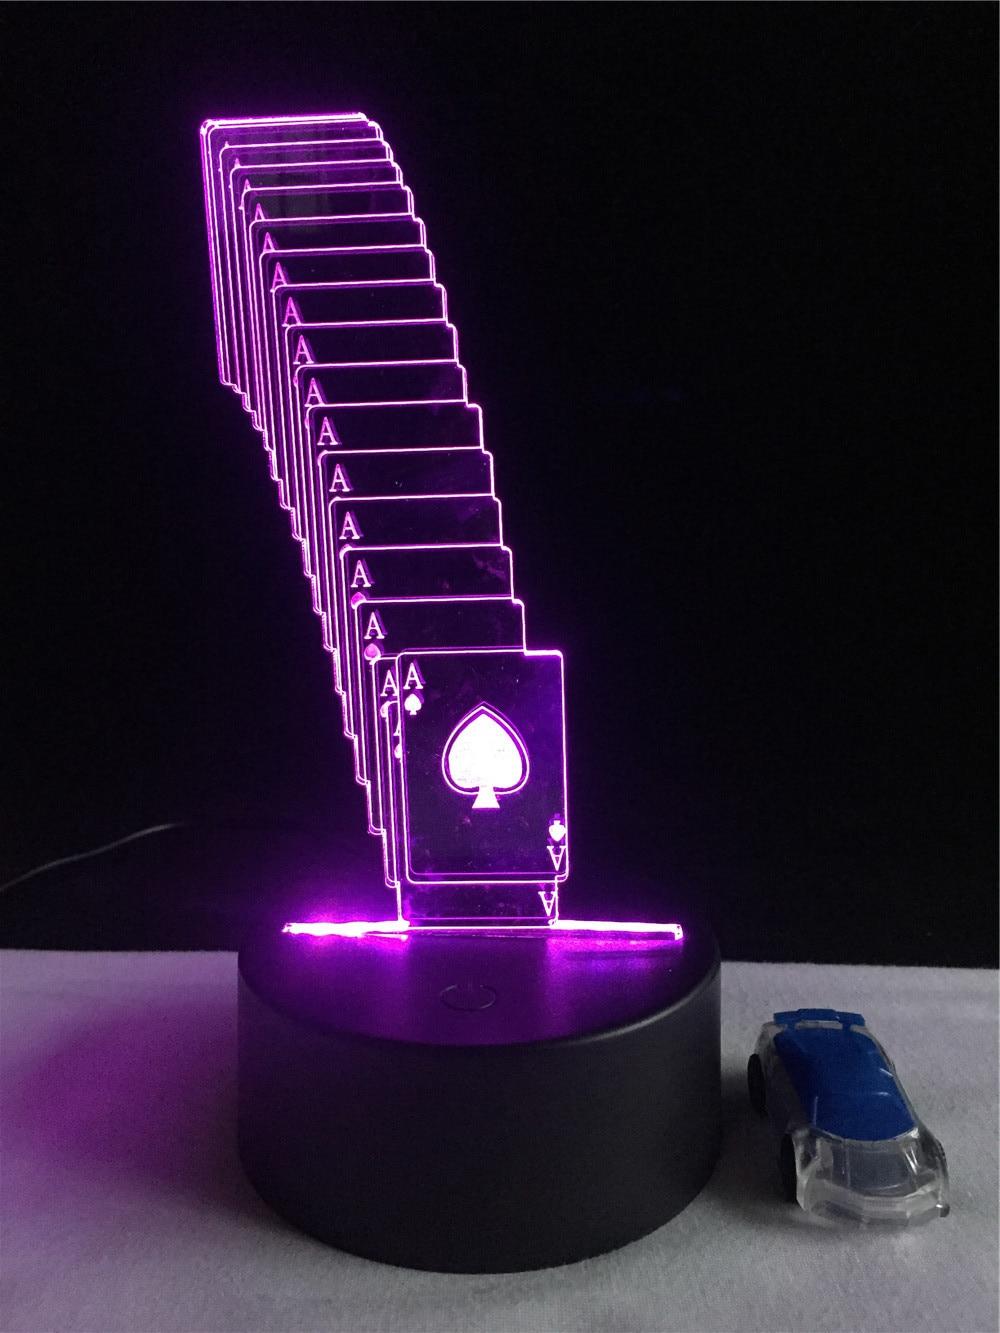 Luzes da Noite rc controle remoto de poker Function 1 : Led Bed Lamp/table Desk Lighting/bar Light